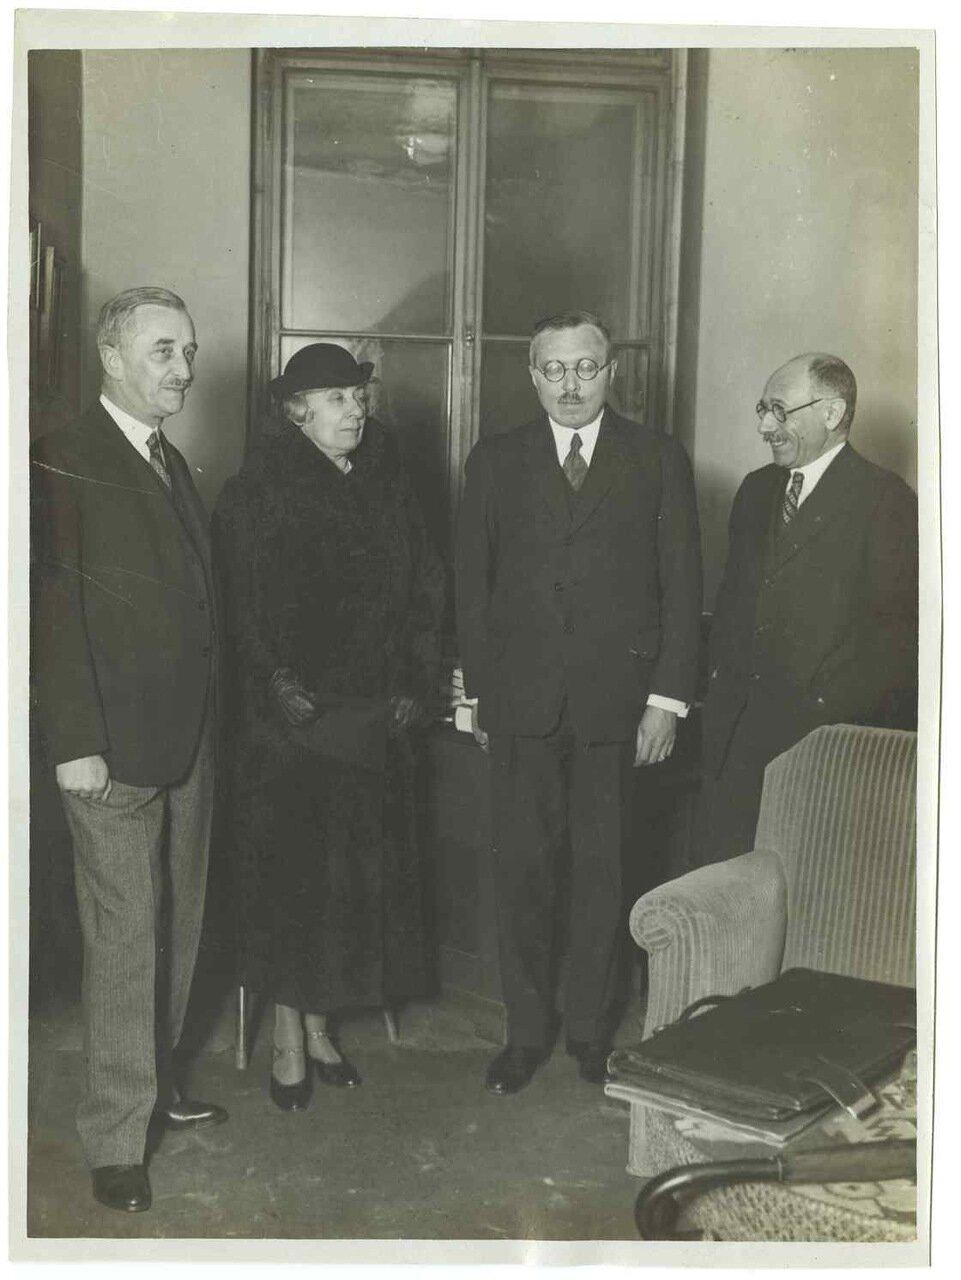 1925. Неклер, З. Рафаэль, Грондейс, граф Пал Телеки де Секи